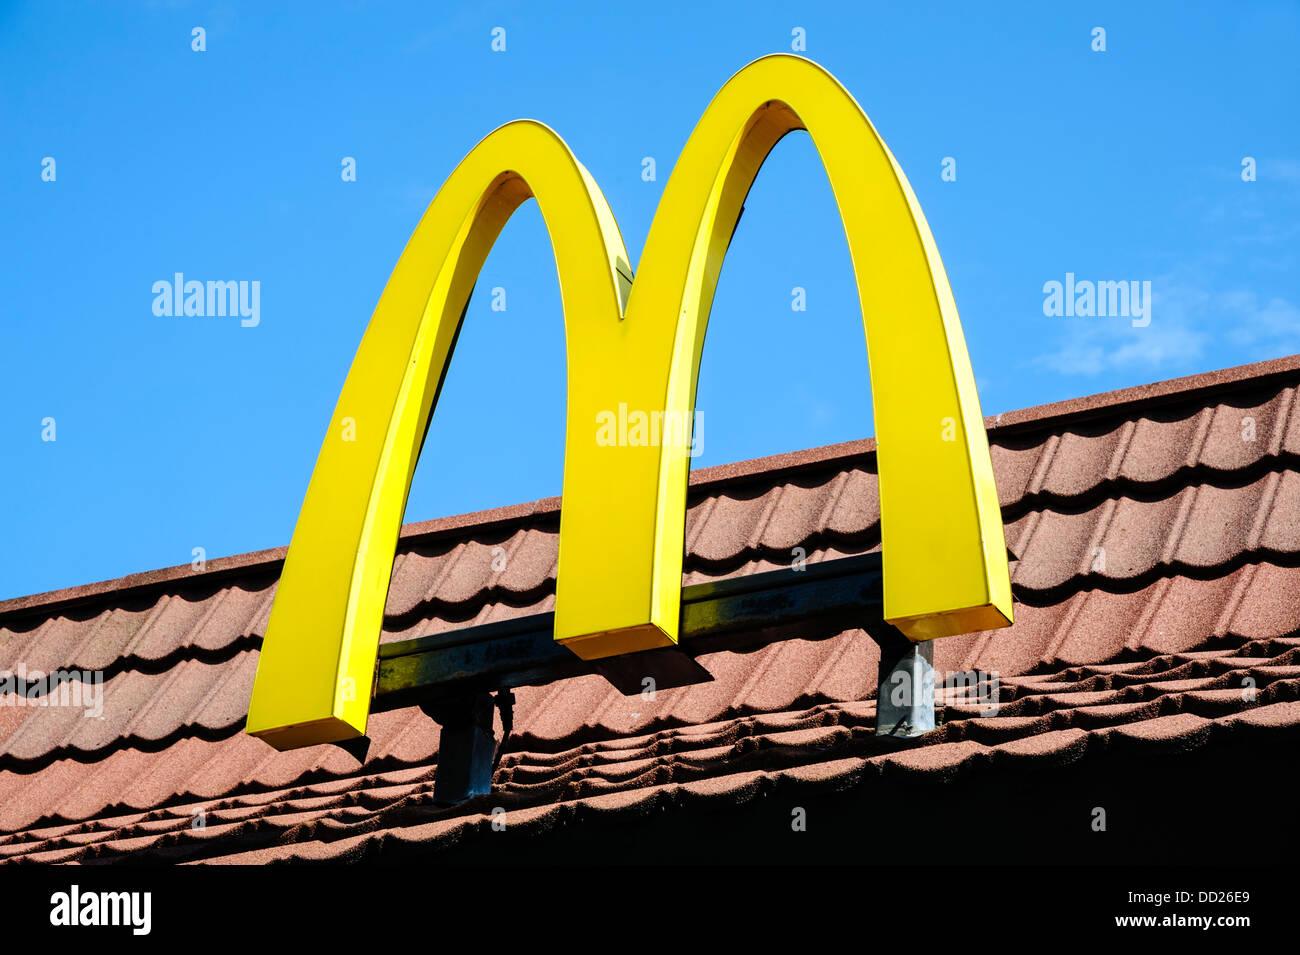 McDonalds restaurant sign, UK. - Stock Image